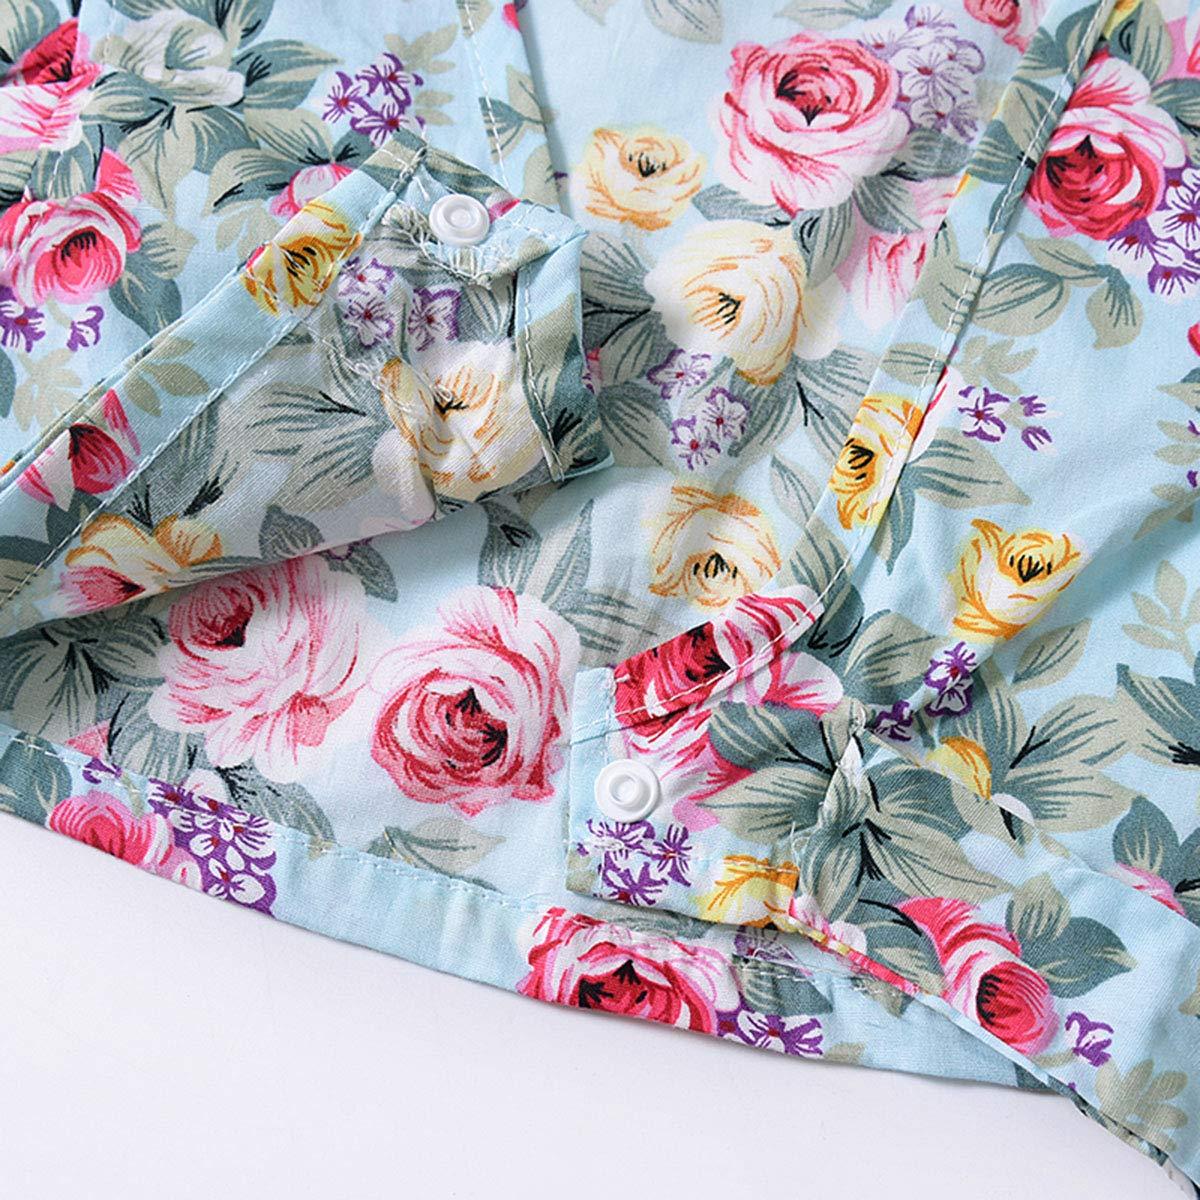 Toddler Baby Girls Floral Slim Strap Crop Top Shirt Flower Skirt Set Dress Outfit